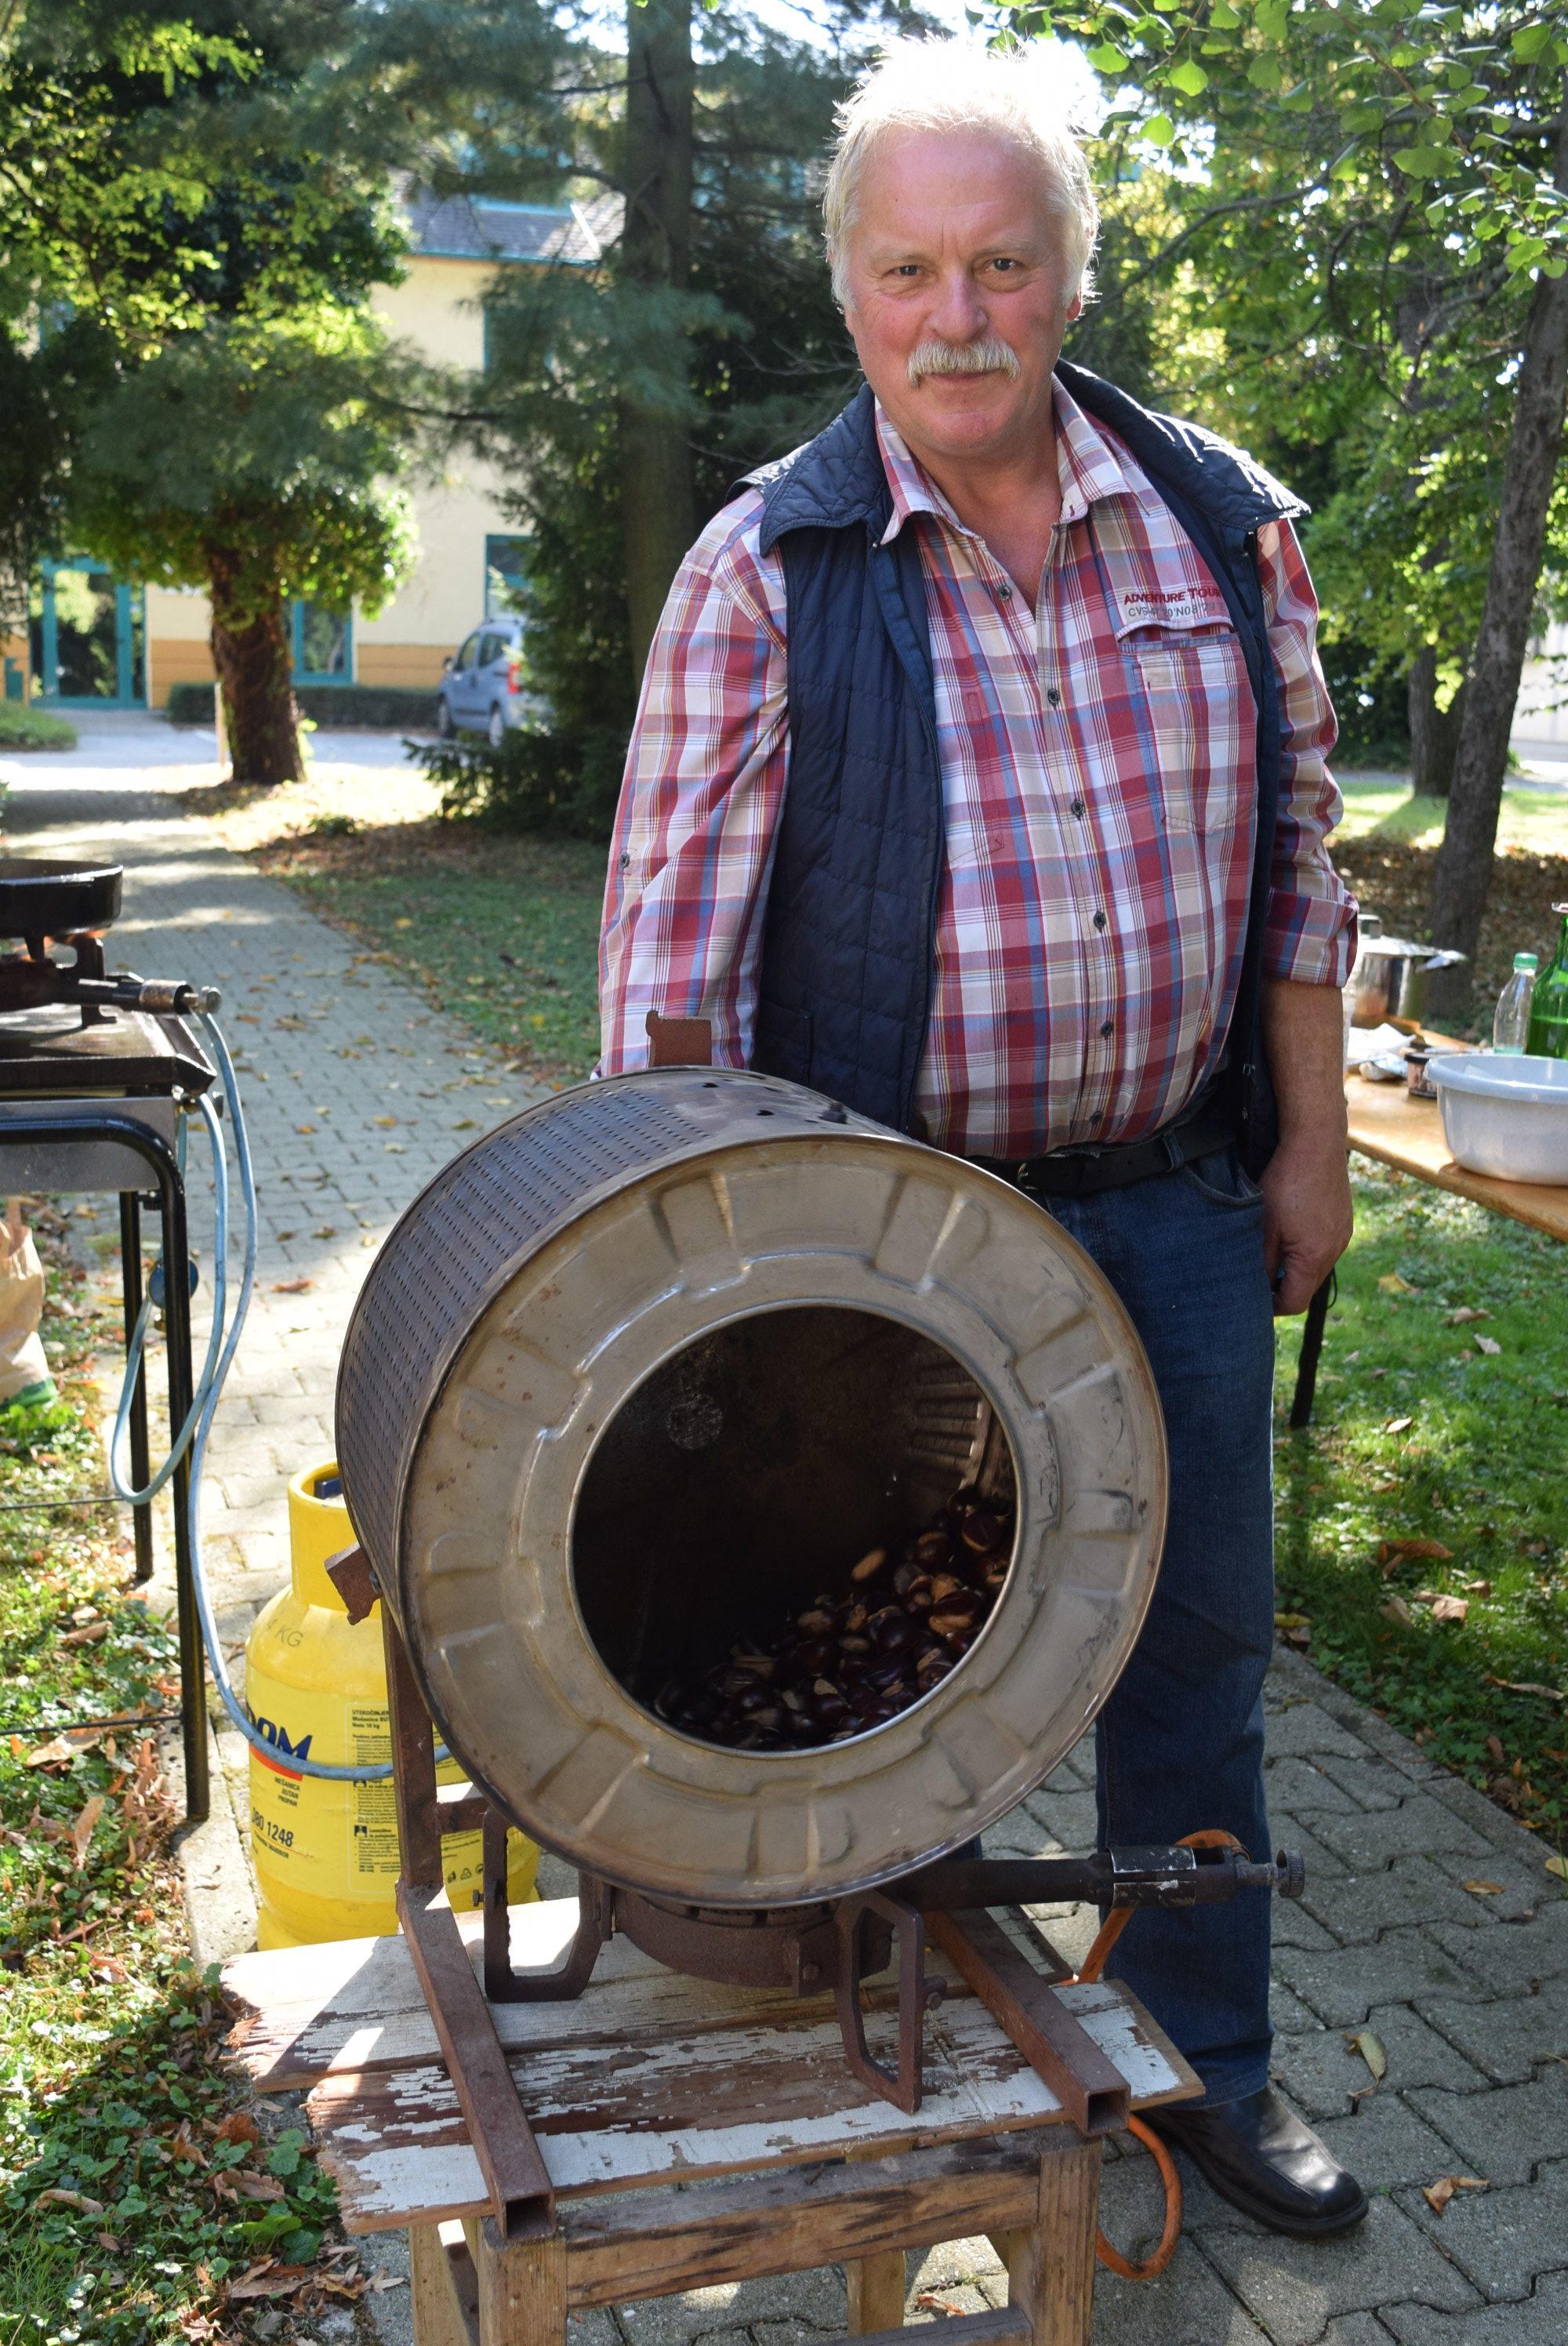 peka-kostanjev